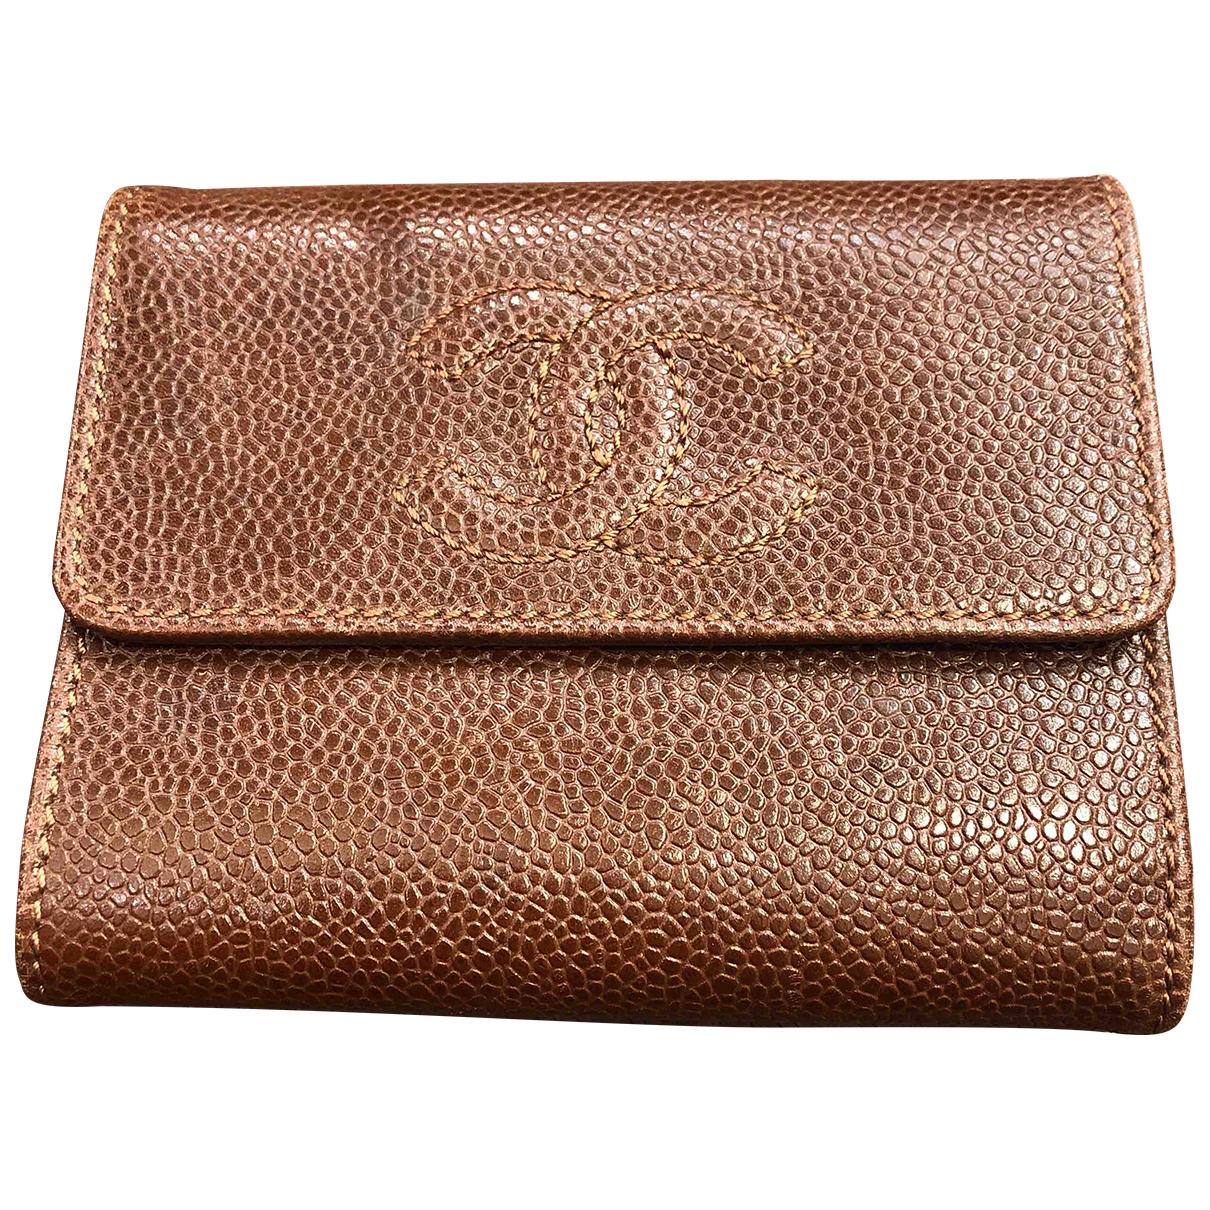 Chanel \N Portemonnaie in  Braun Leder